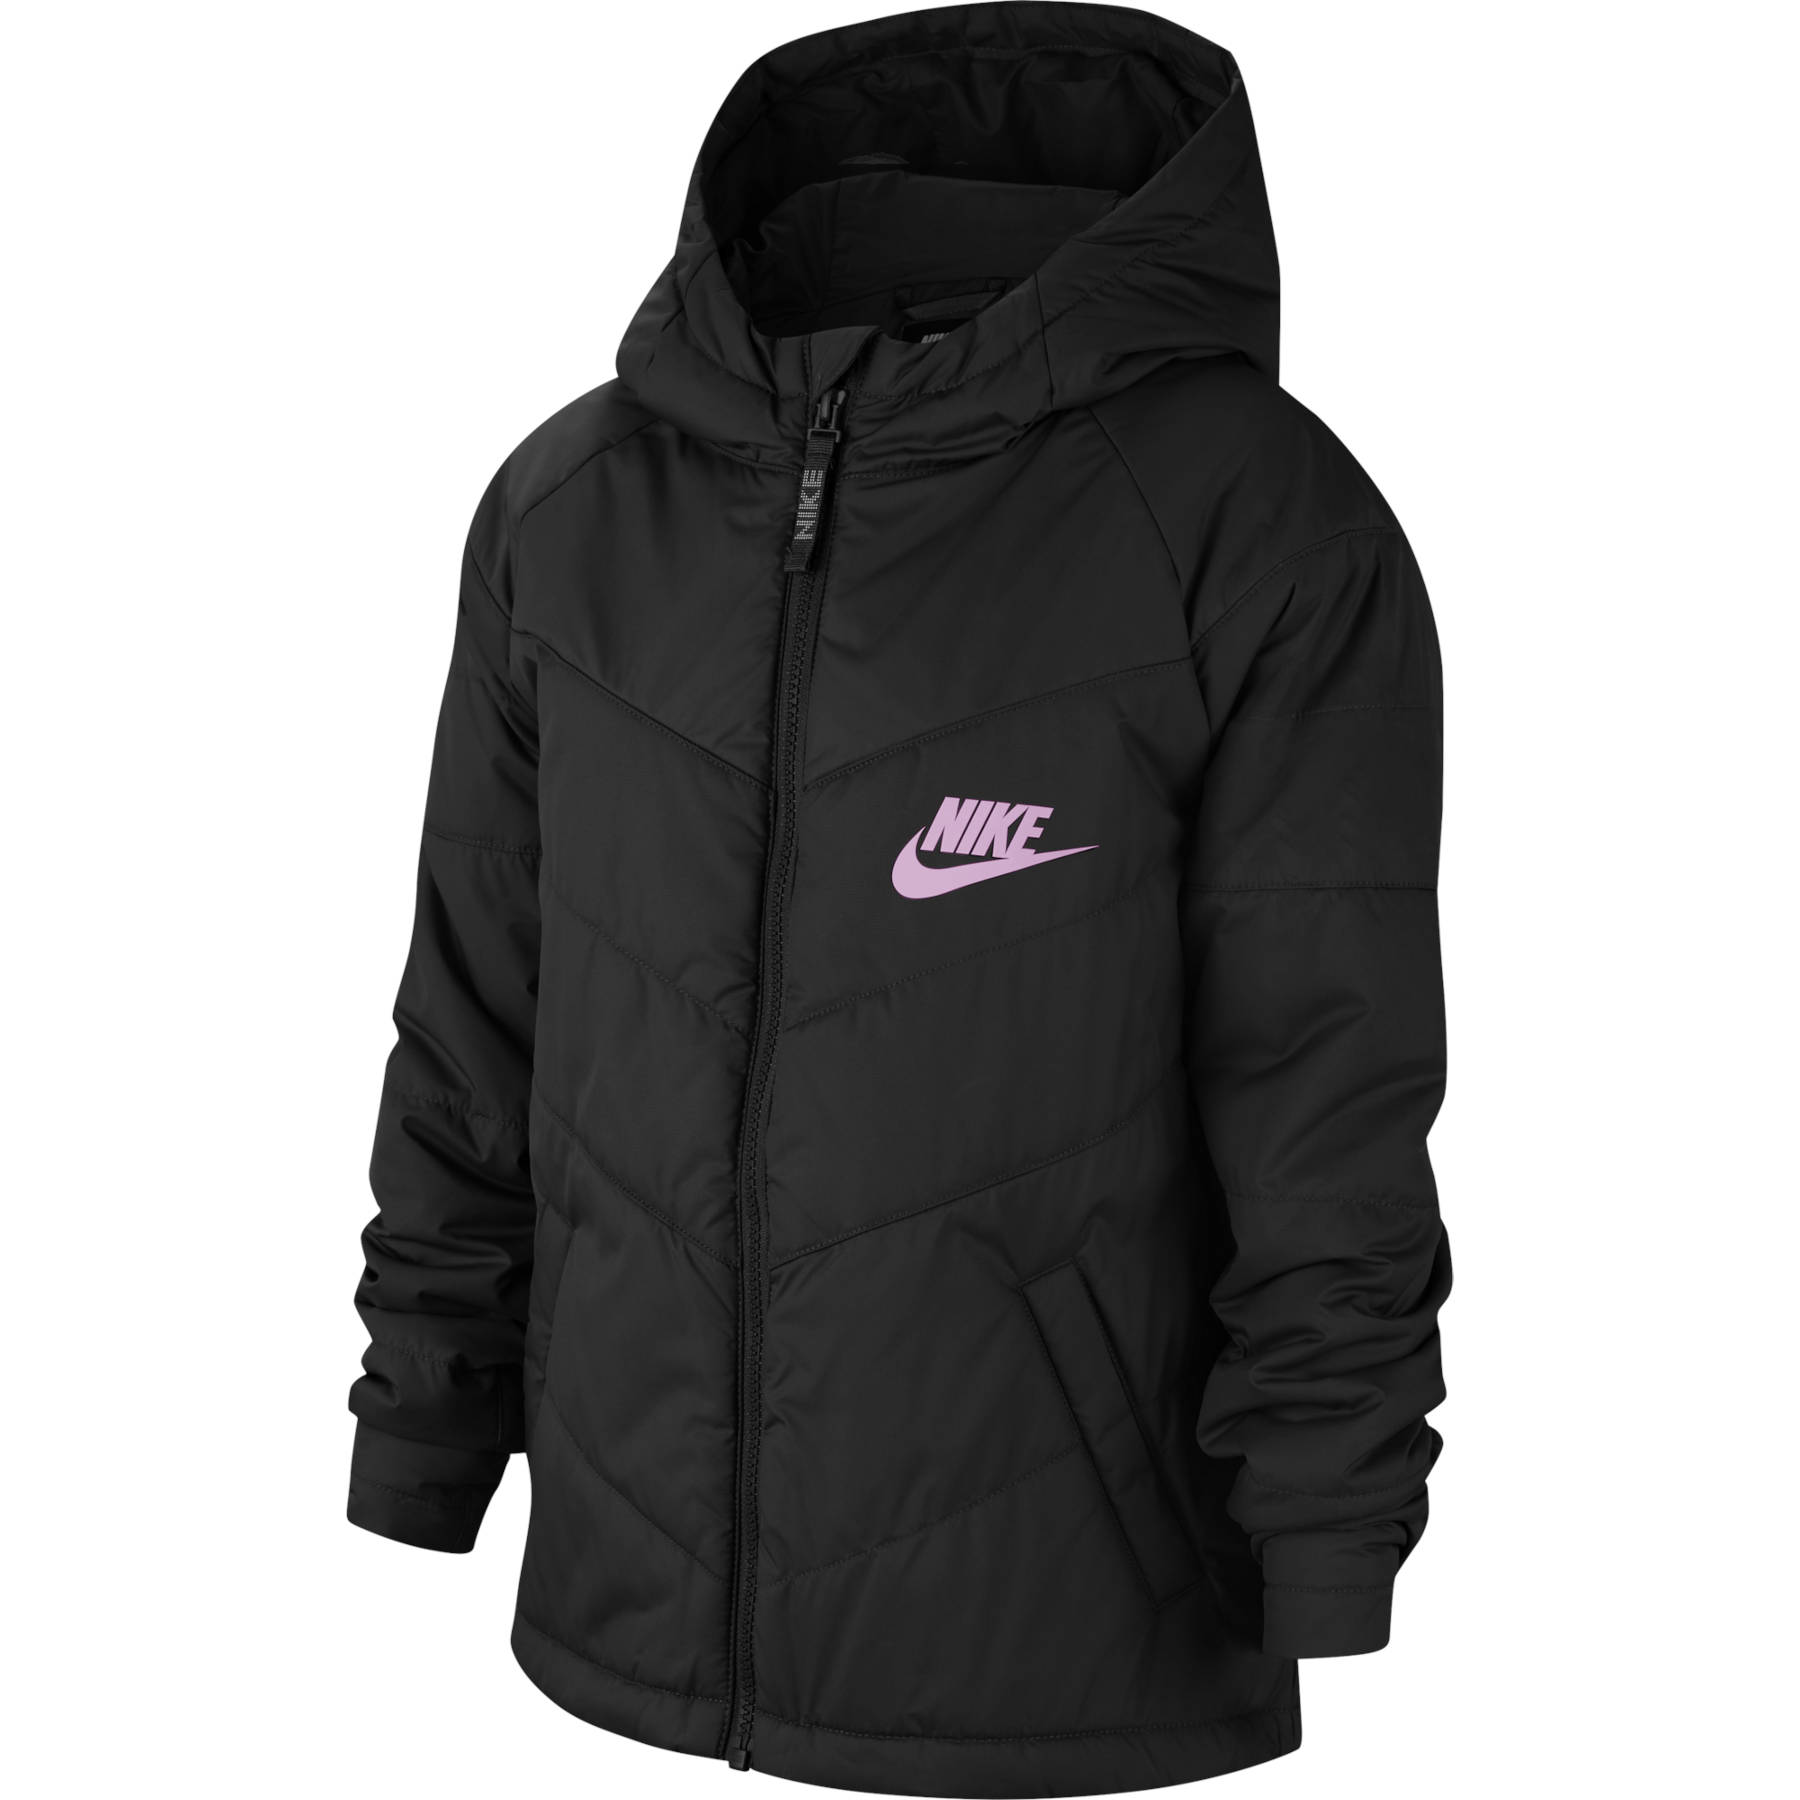 Nike Sportswear Jacke für ältere Kinder - black/black/black/light arctic pink CU9157-013